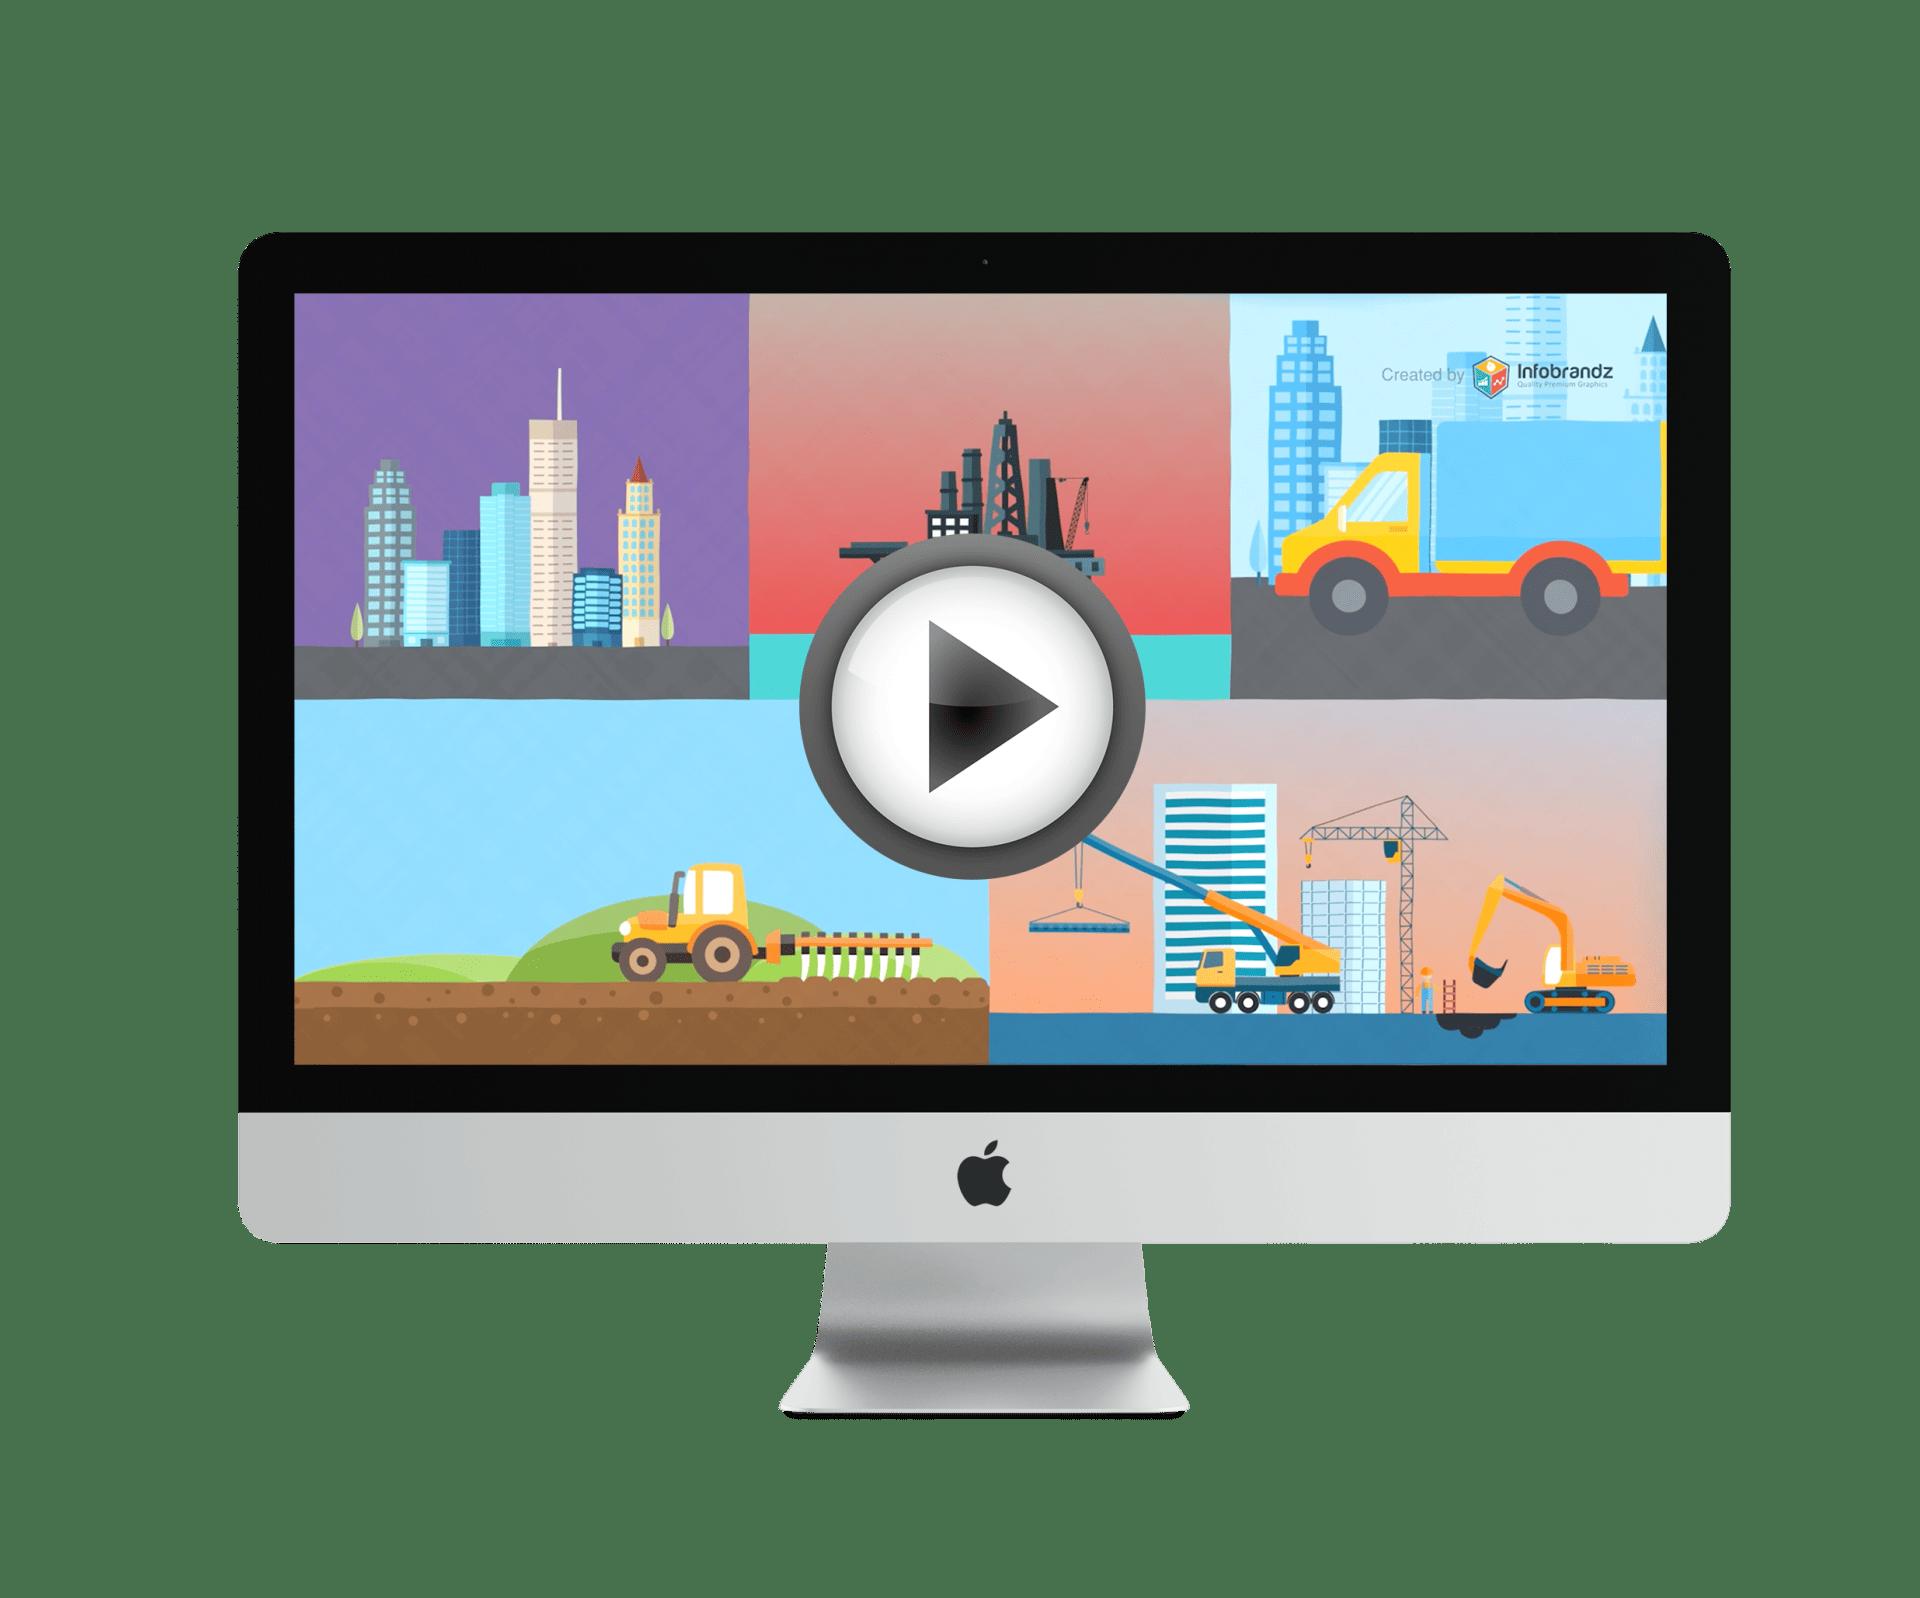 services,infographic design,ebook design,pitch deck design,designing explainer videos